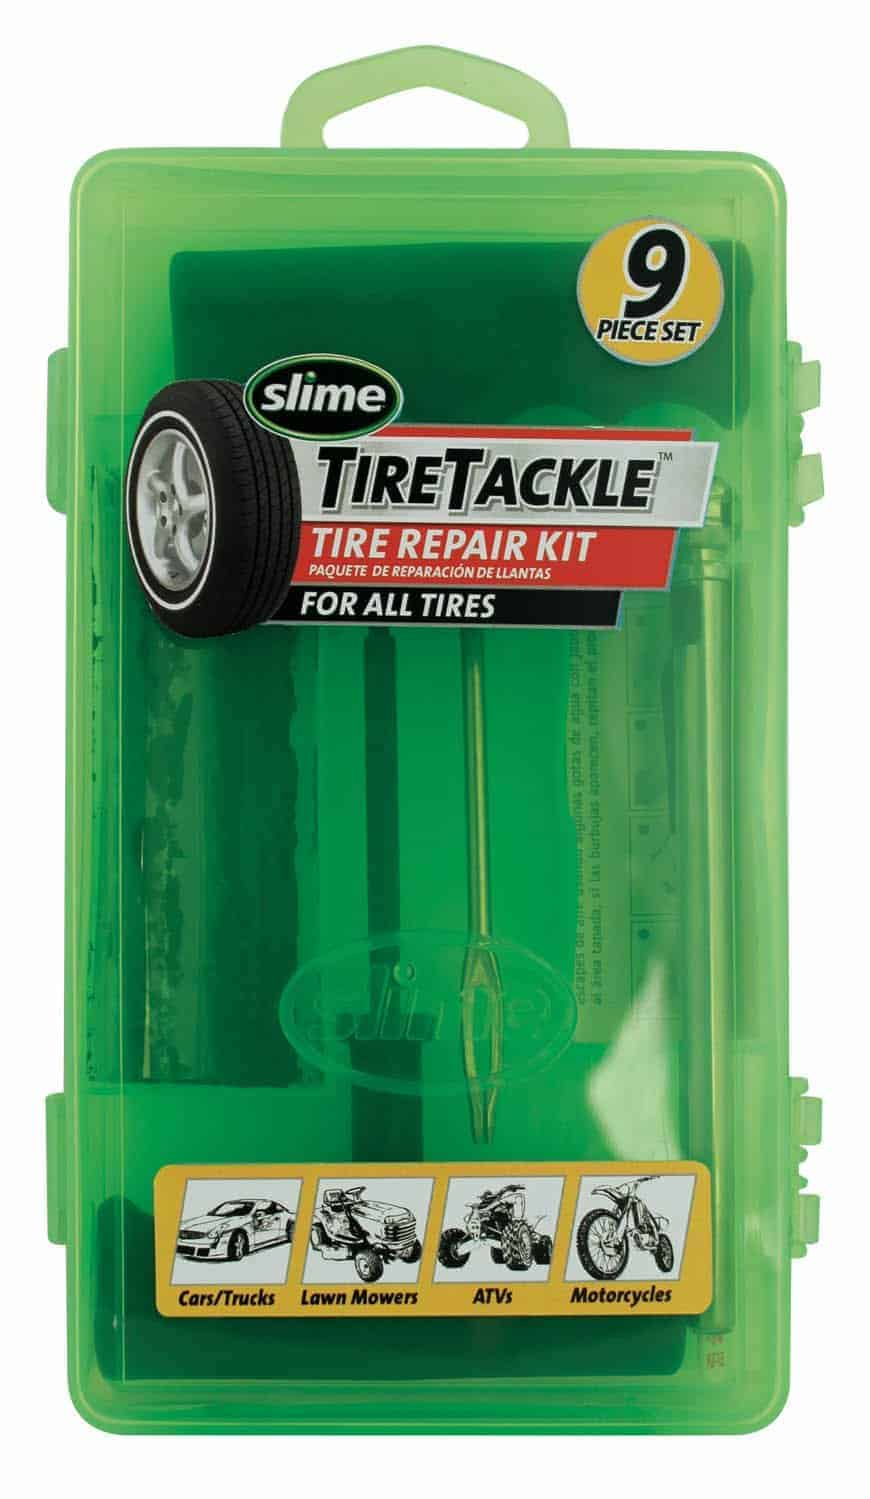 Slime Brand - Most basic Tire Repair Kit